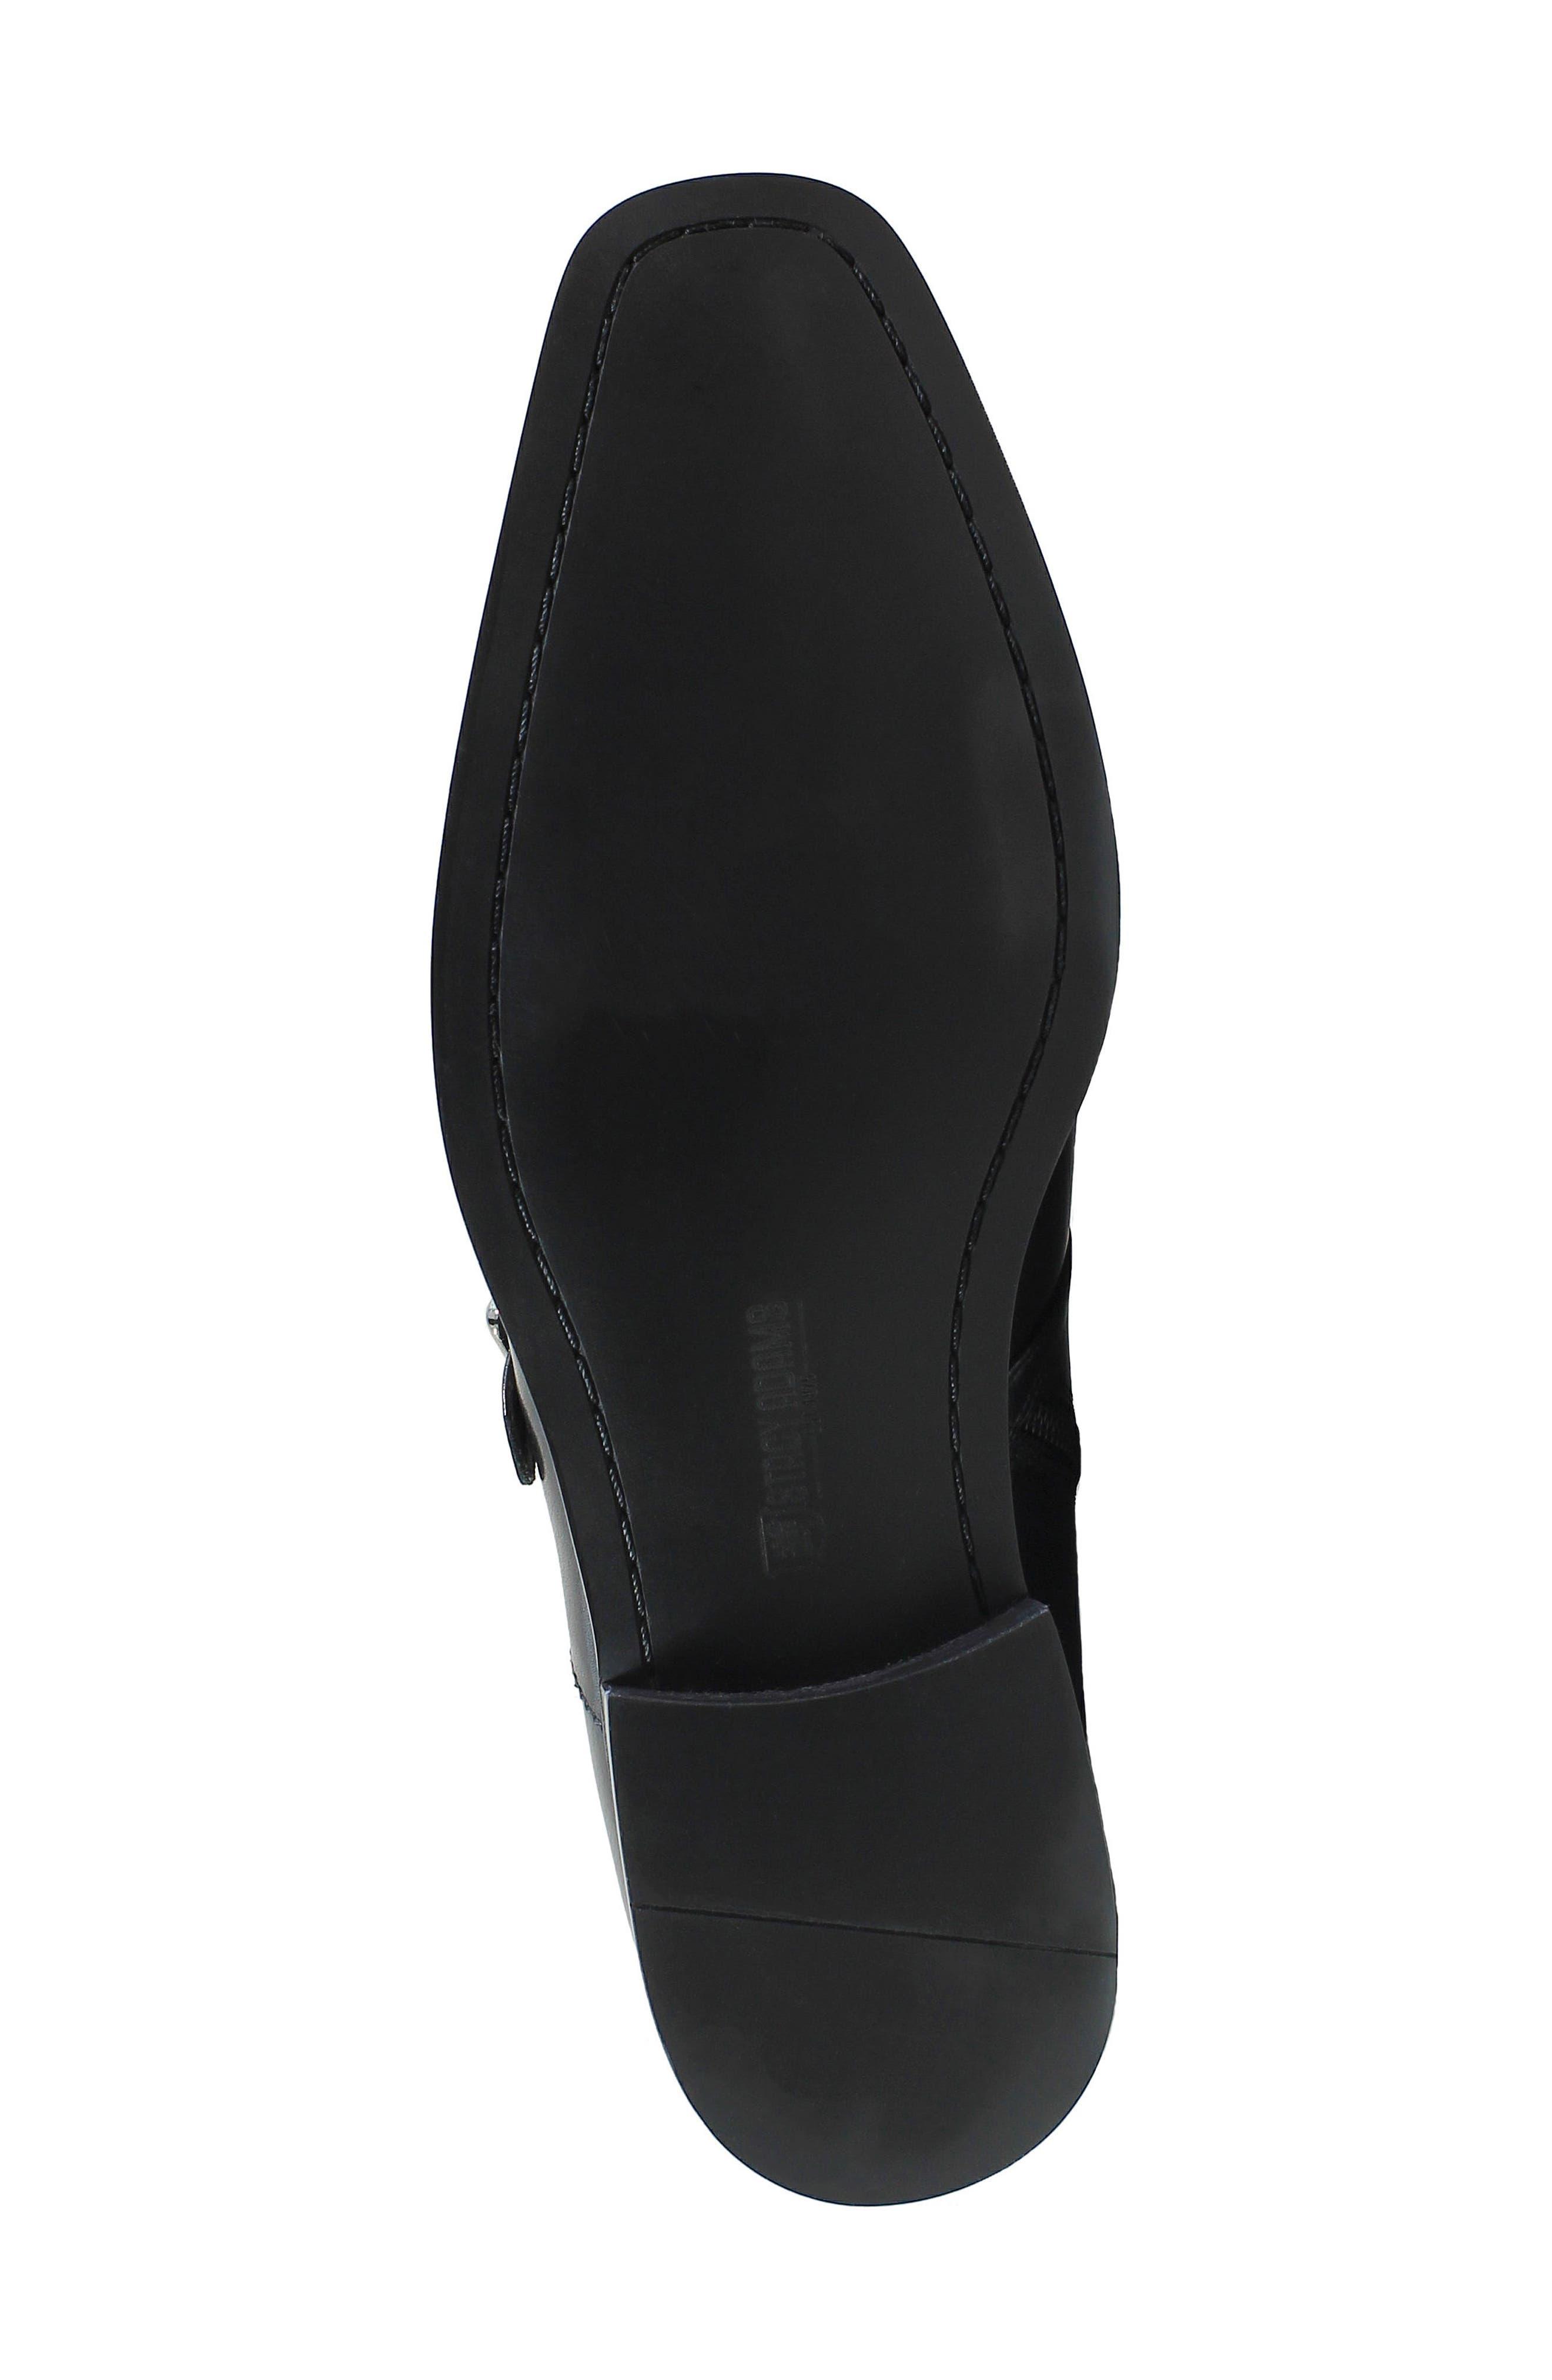 Kason Double Monk Strap Boot,                             Alternate thumbnail 6, color,                             Black Leather